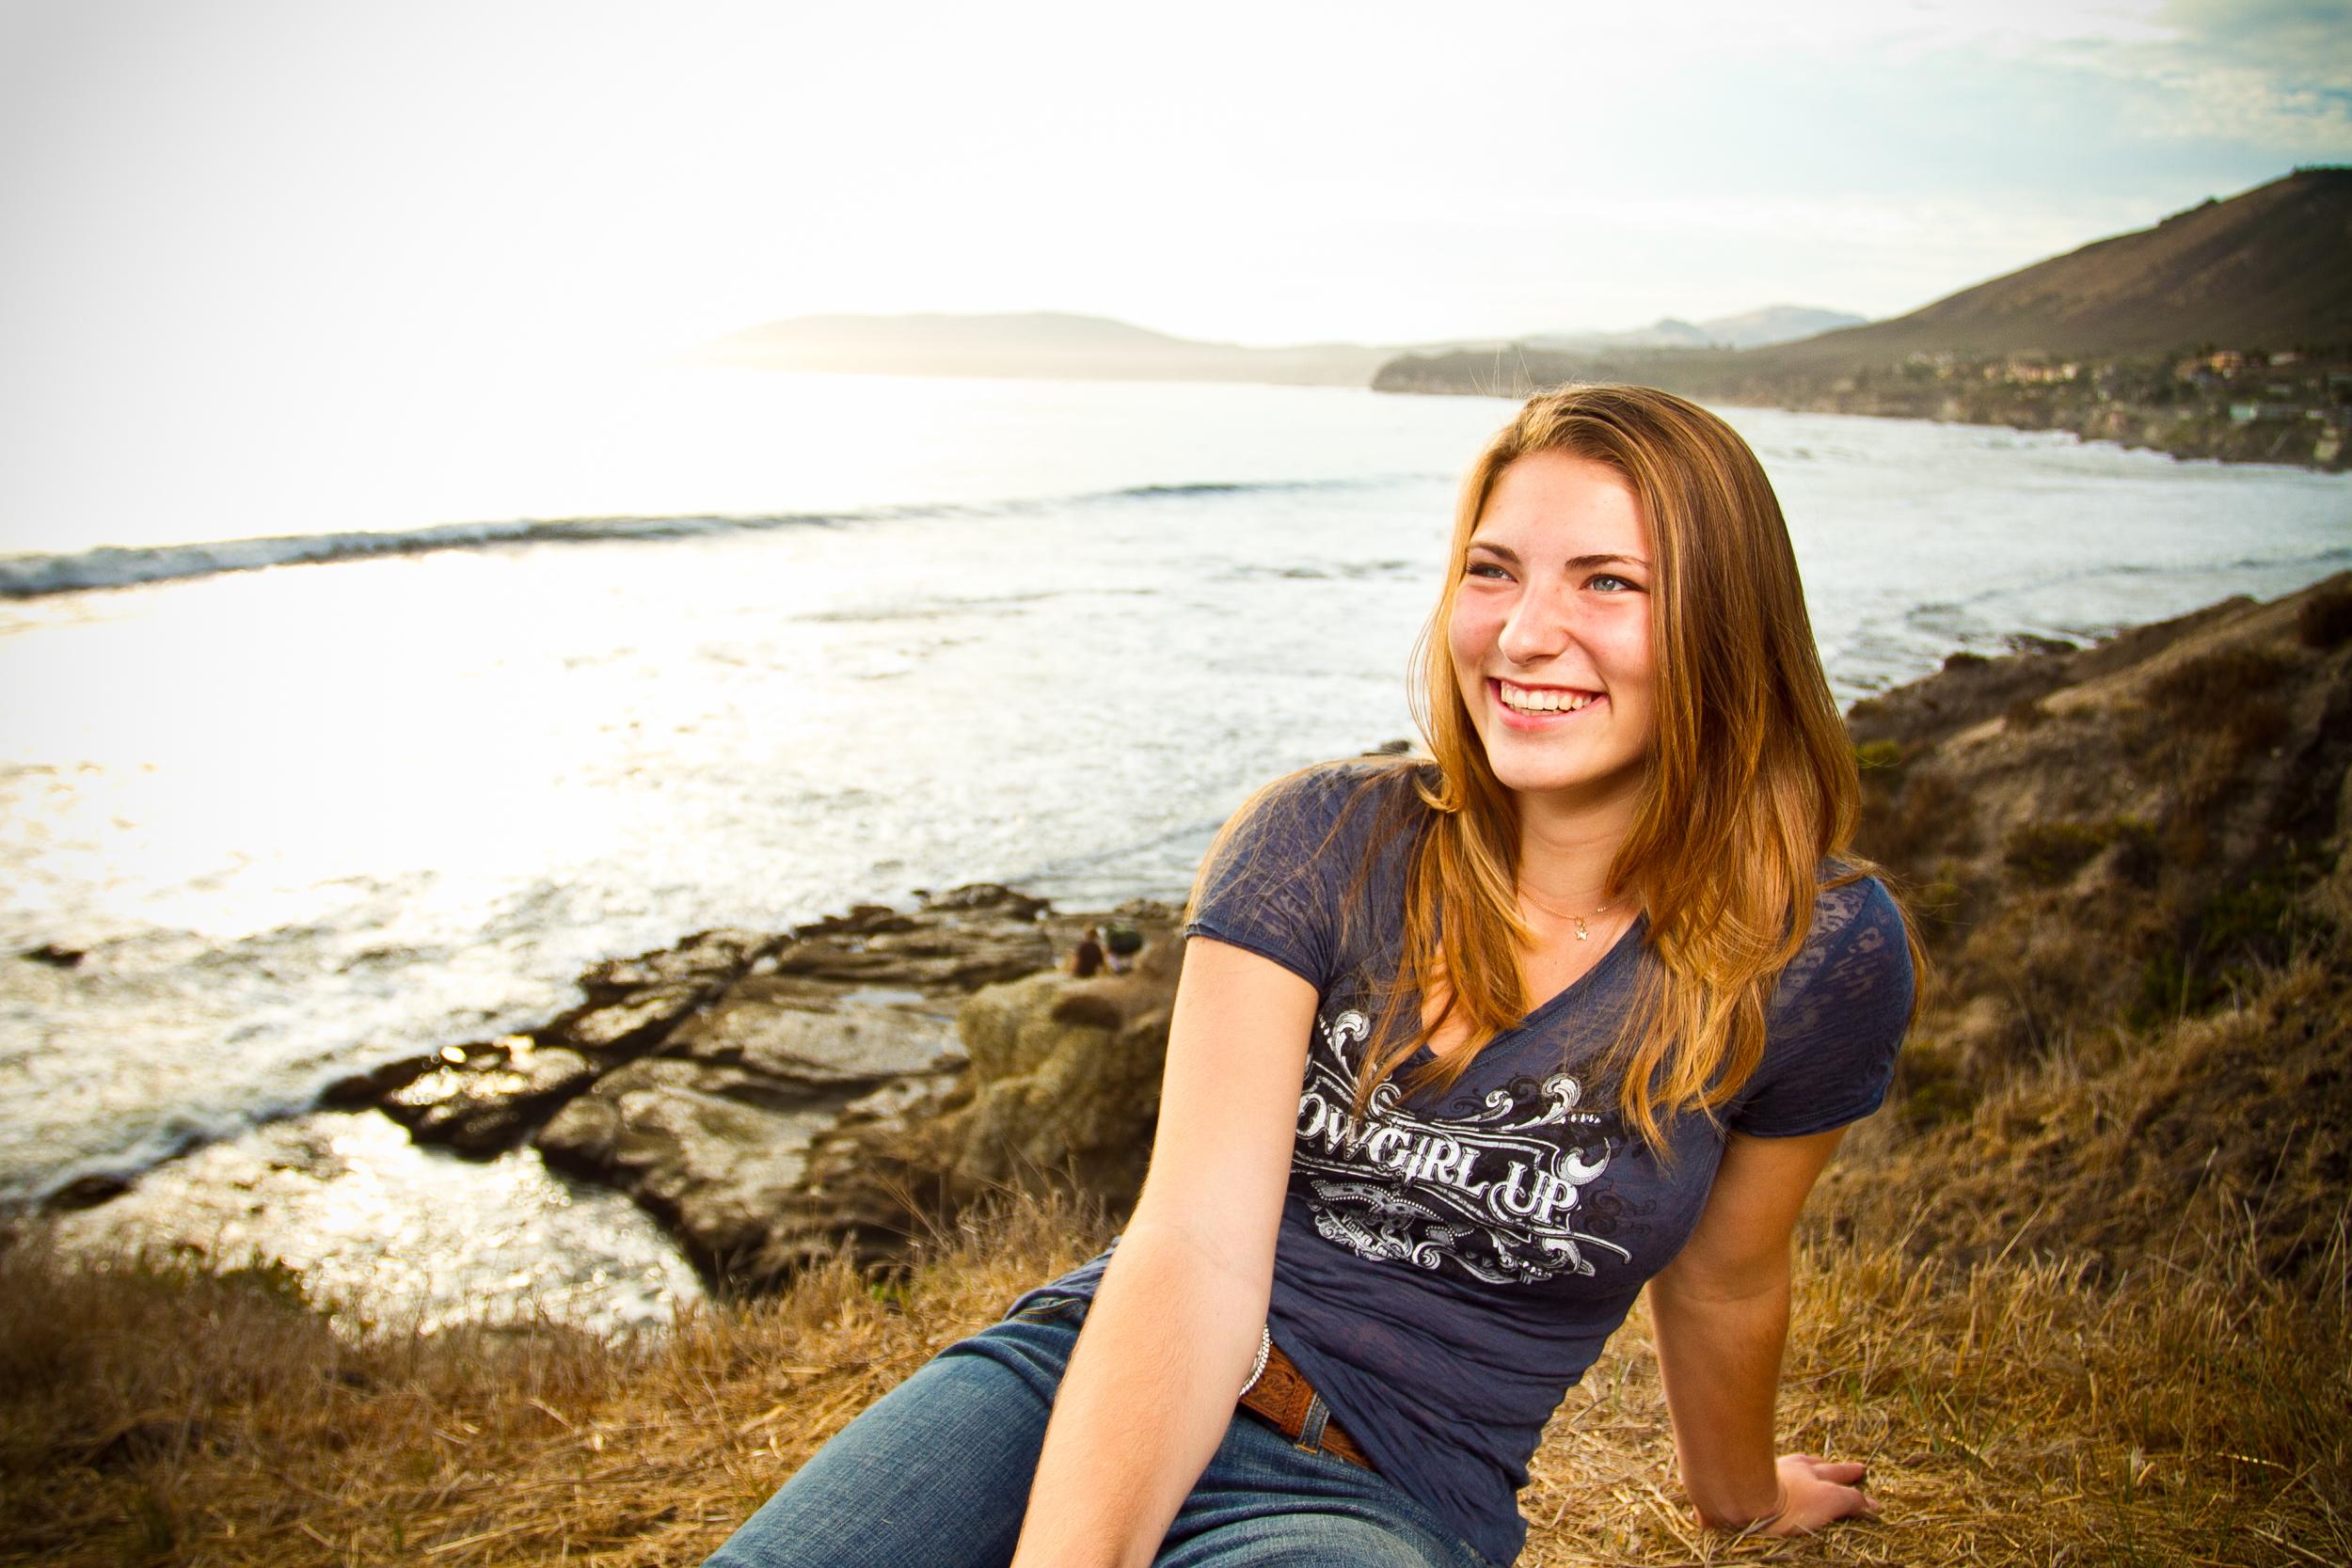 Senior Portrait Session, Pismo Beach, CA / Shell Beach